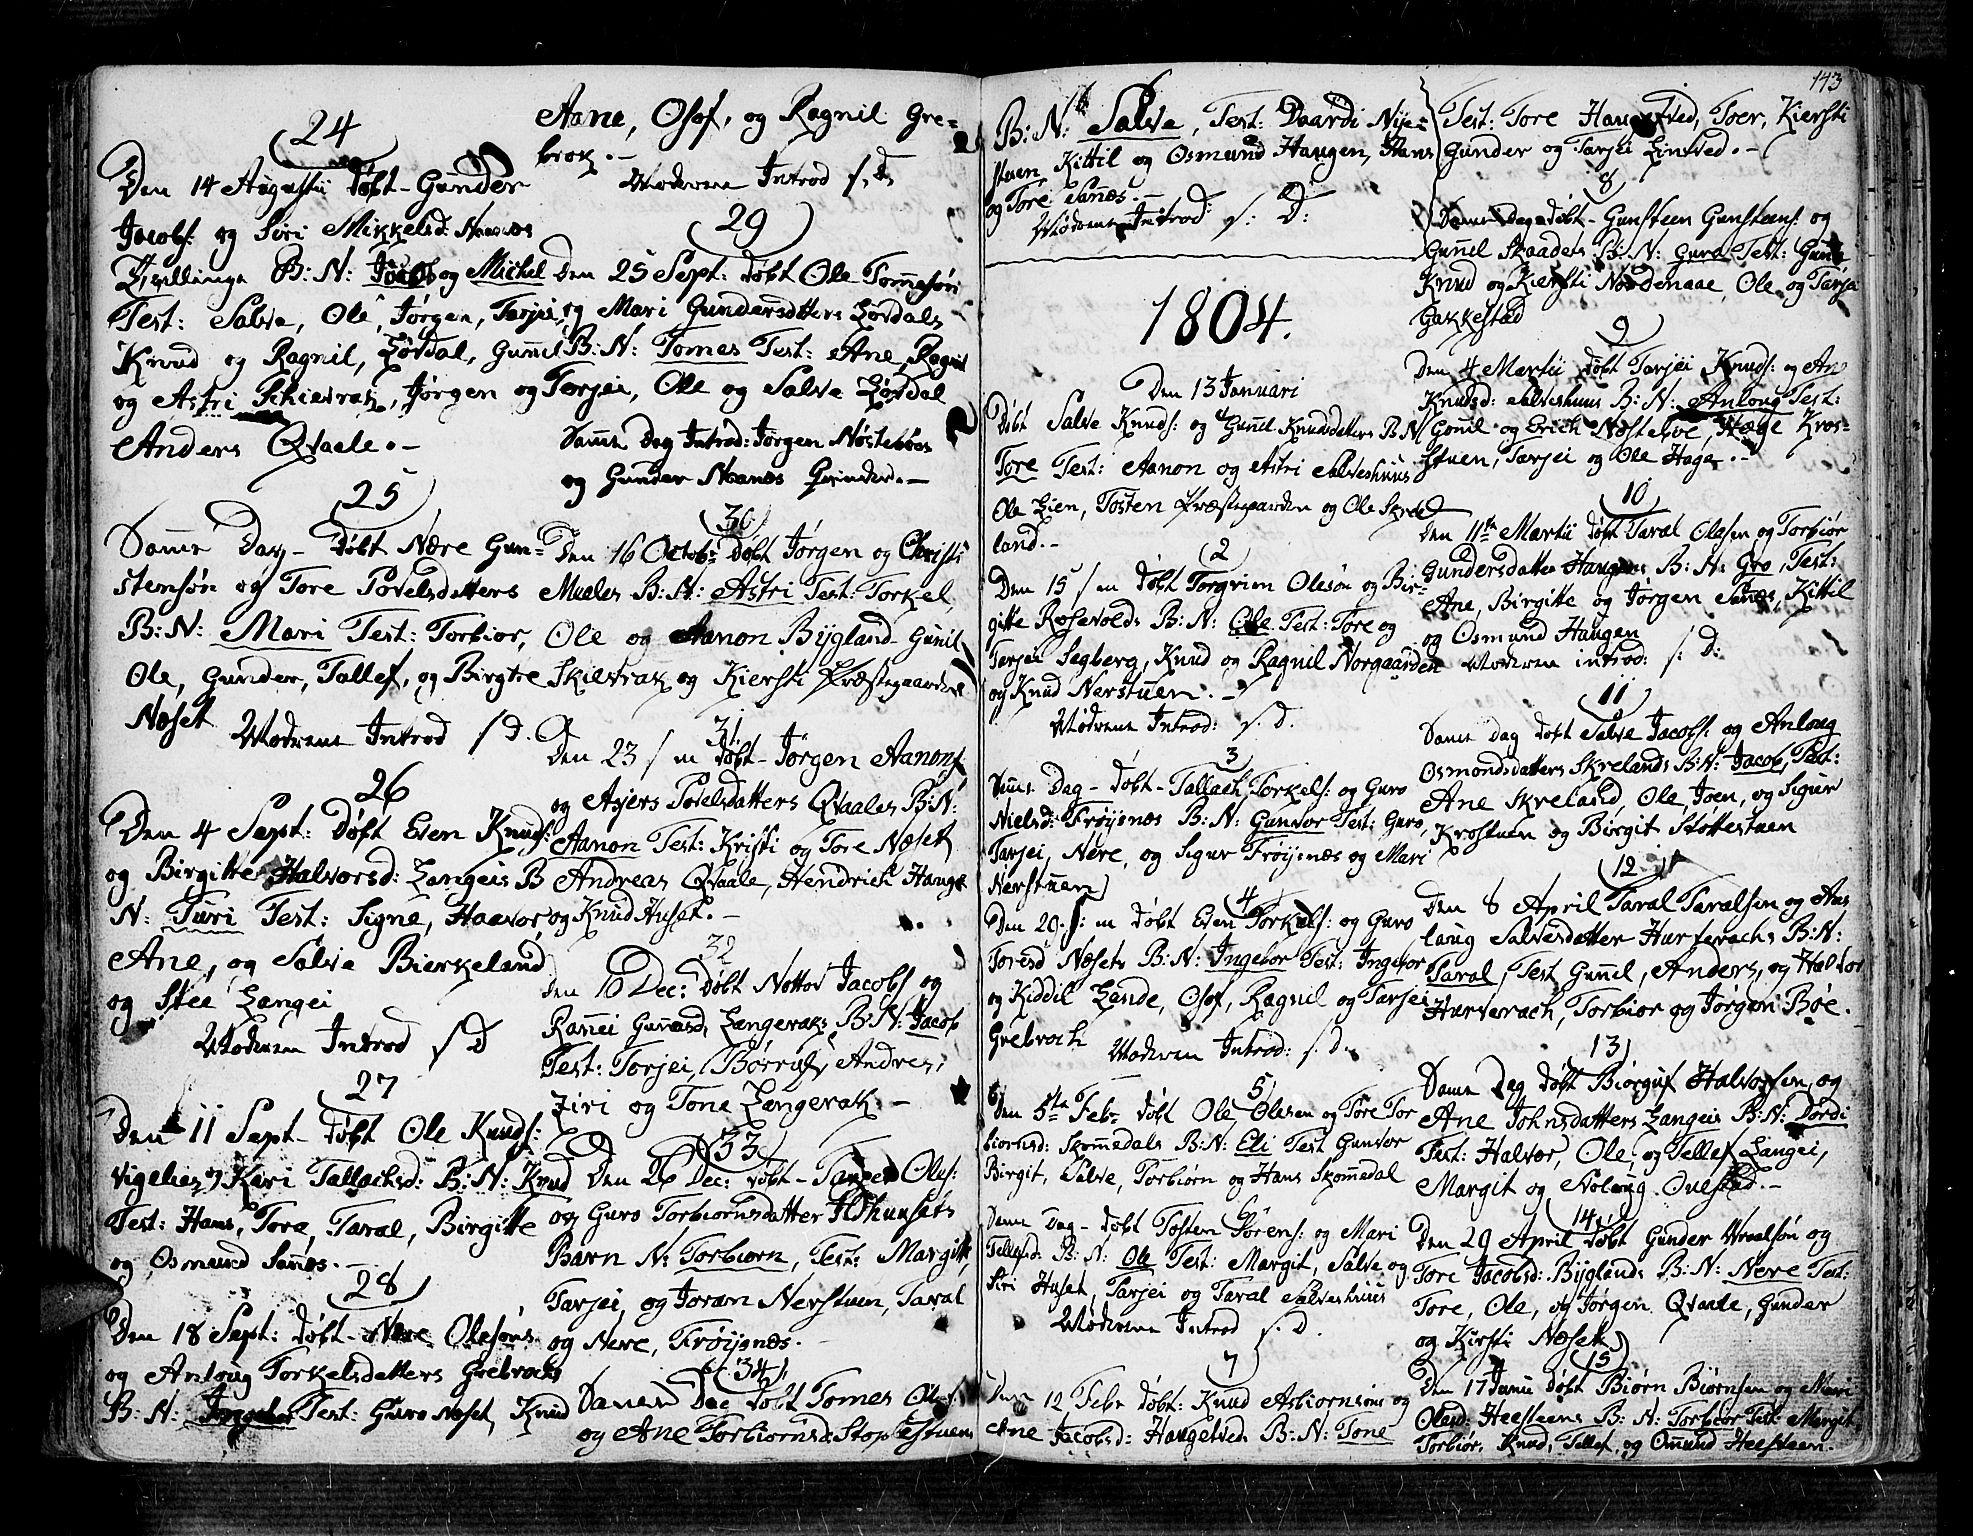 SAK, Bygland sokneprestkontor, F/Fa/Fab/L0002: Ministerialbok nr. A 2, 1766-1816, s. 137